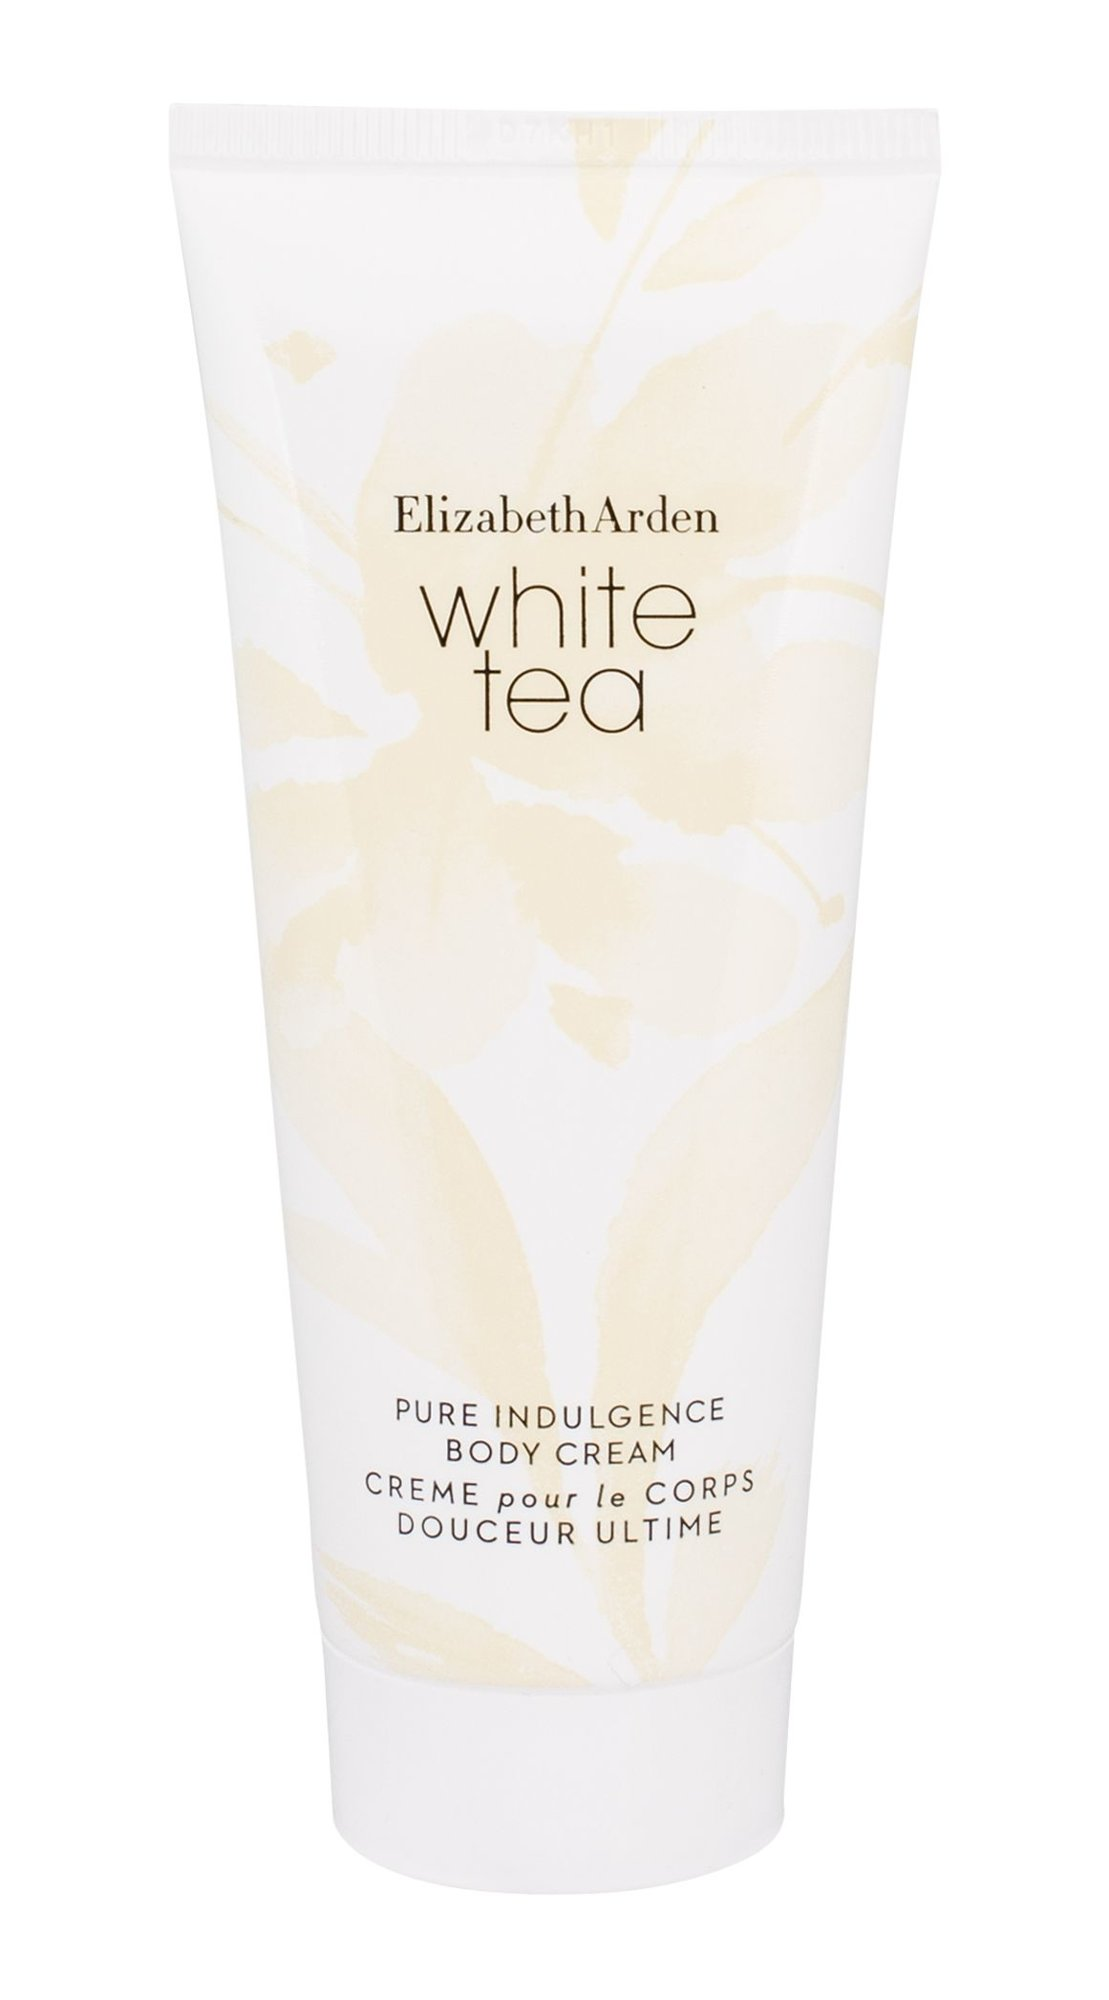 Elizabeth Arden White Tea Body cream 100ml